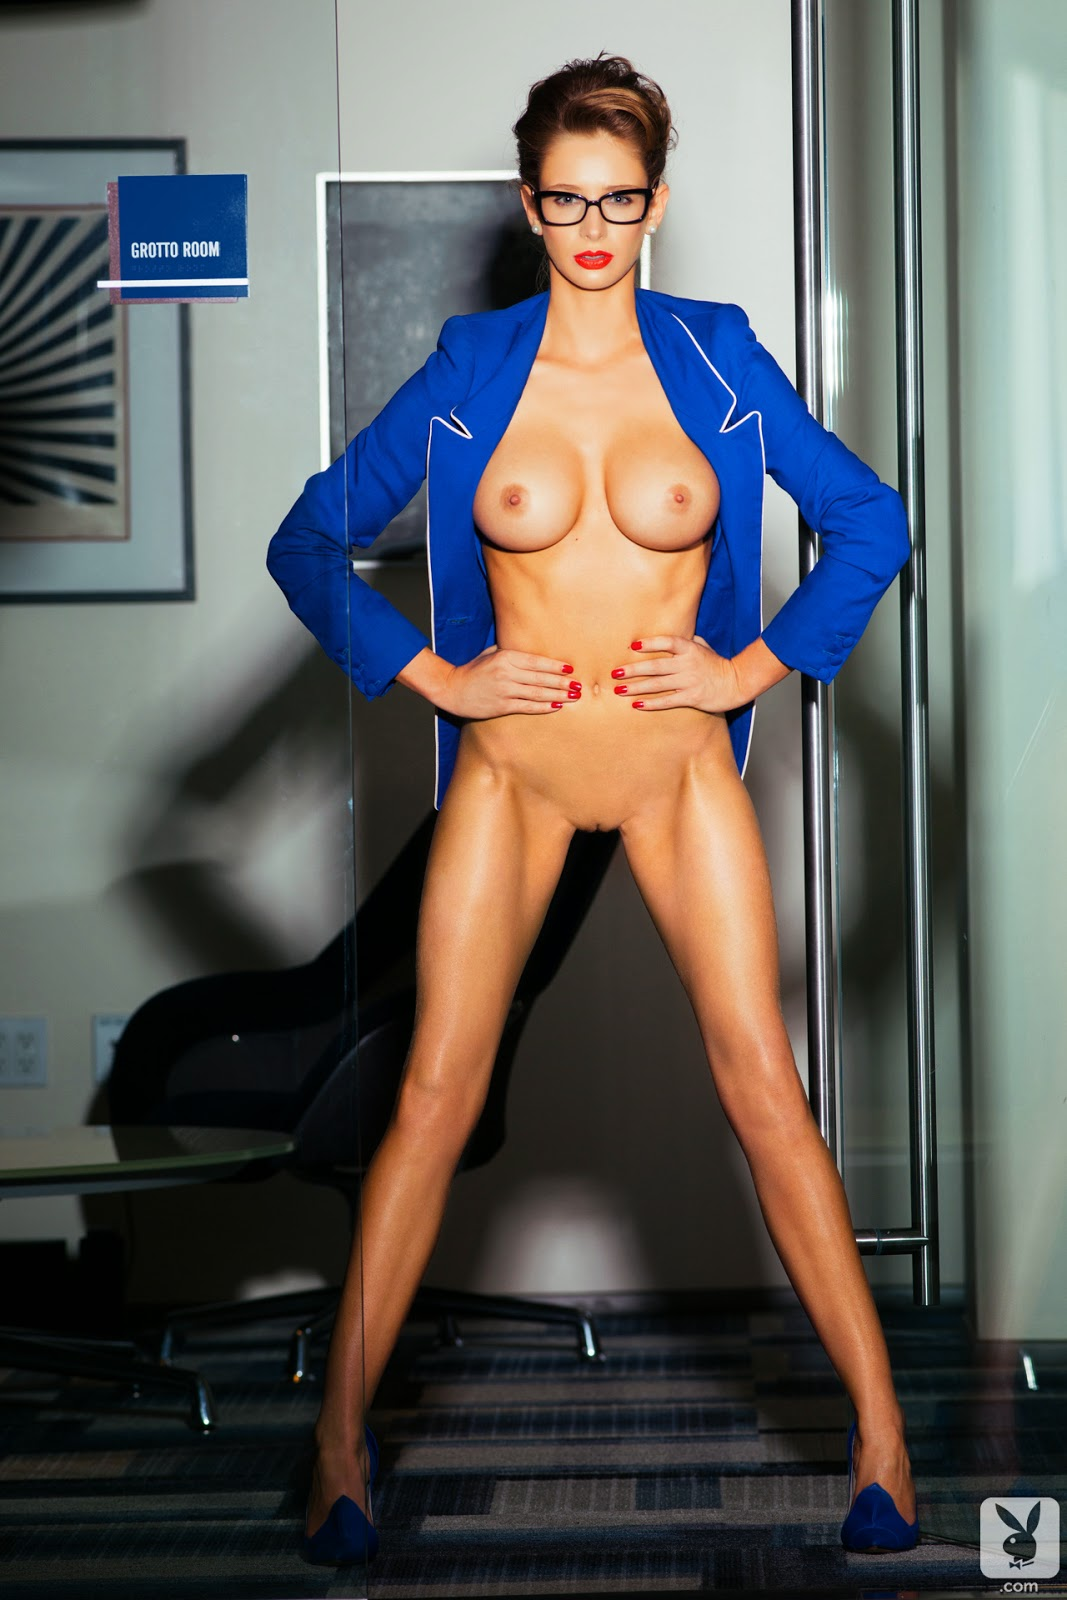 Model Montok Sexy Internasional Ngentot - Download Bokep Indonesia ...